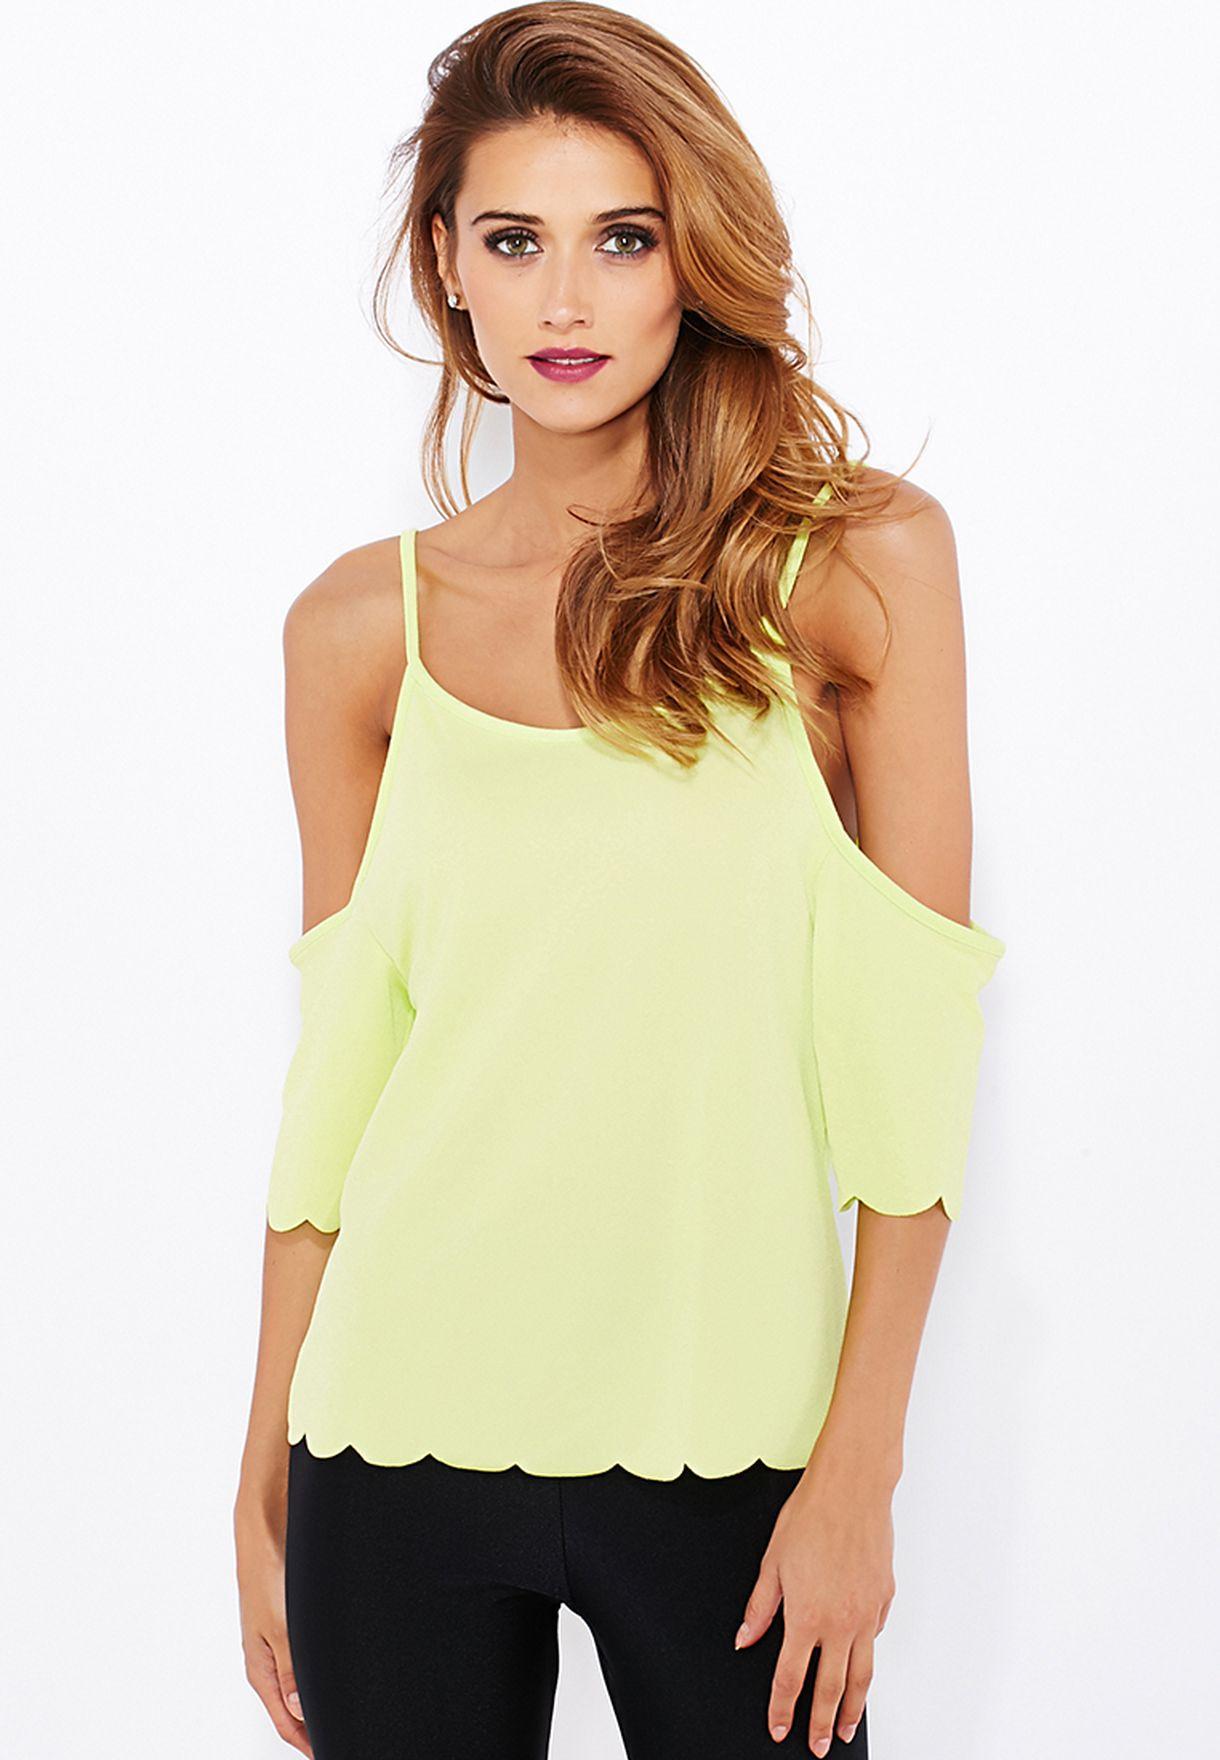 cb7b10e8a86b Shop Boohoo yellow Scallop Hem Open Shoulder Top AZZ08722 for Women ...